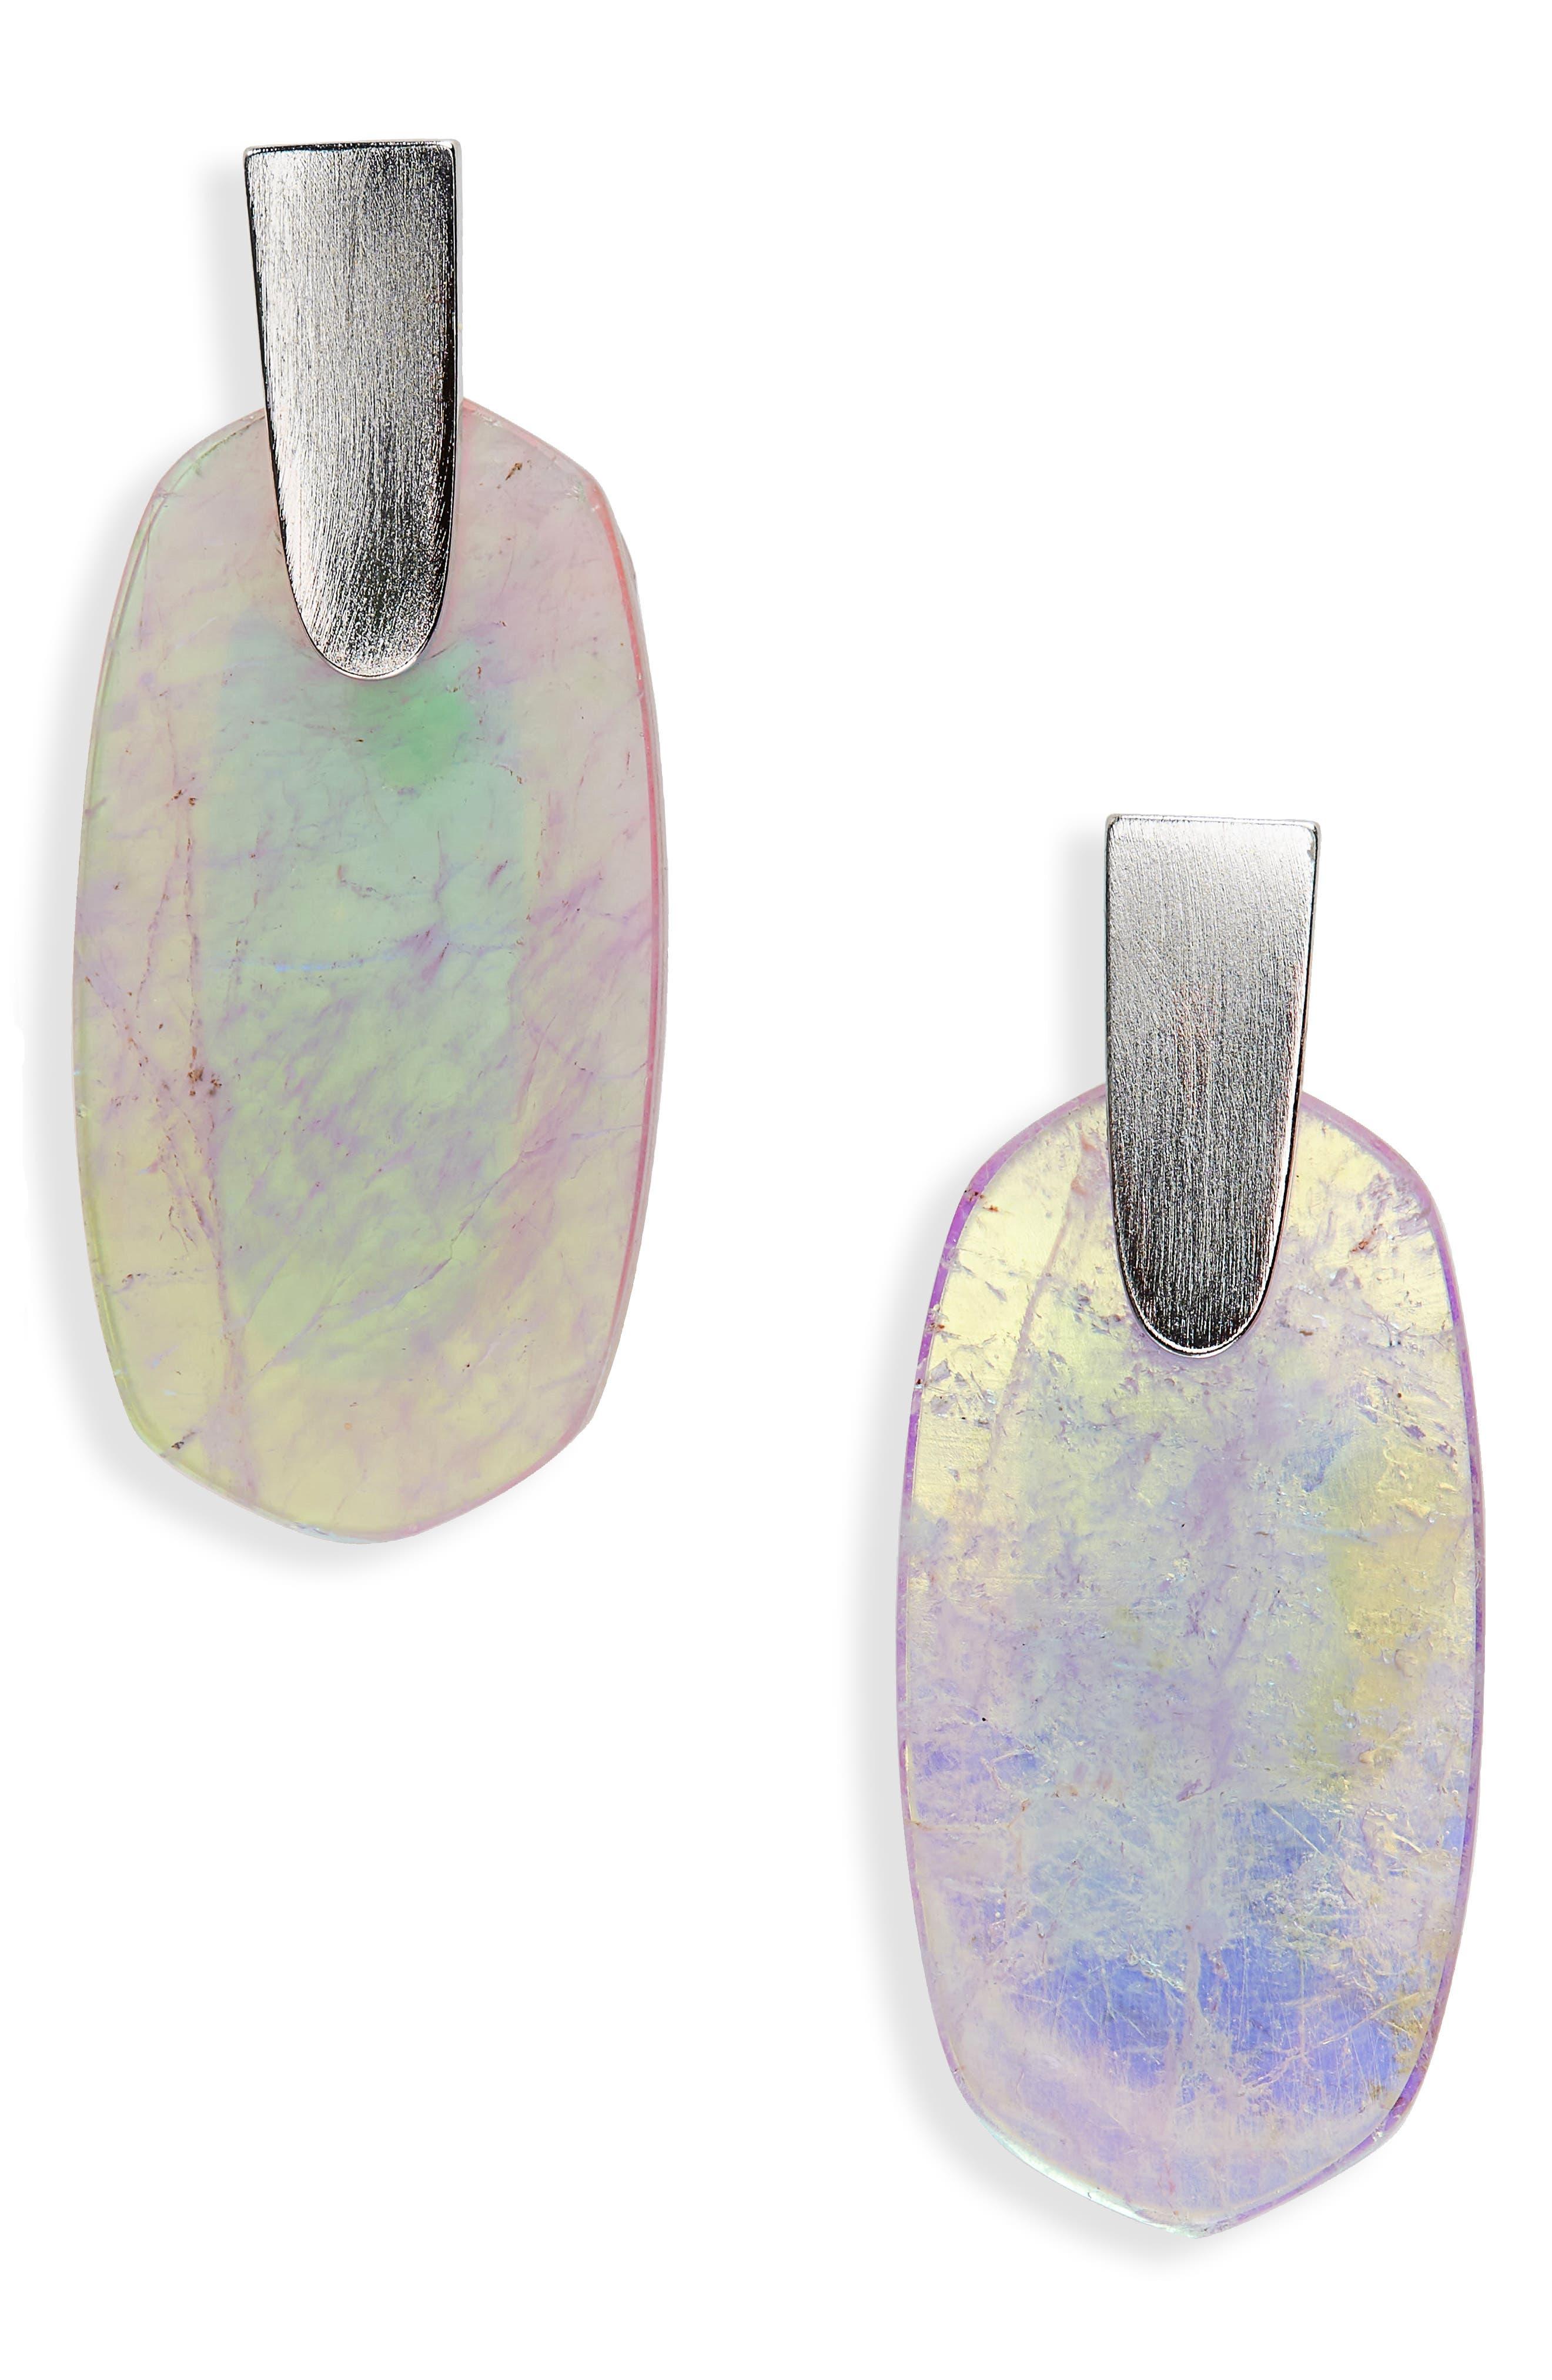 Aragon Drop Earrings,                             Main thumbnail 1, color,                             AMETHYST DICHROIC/ SILVER